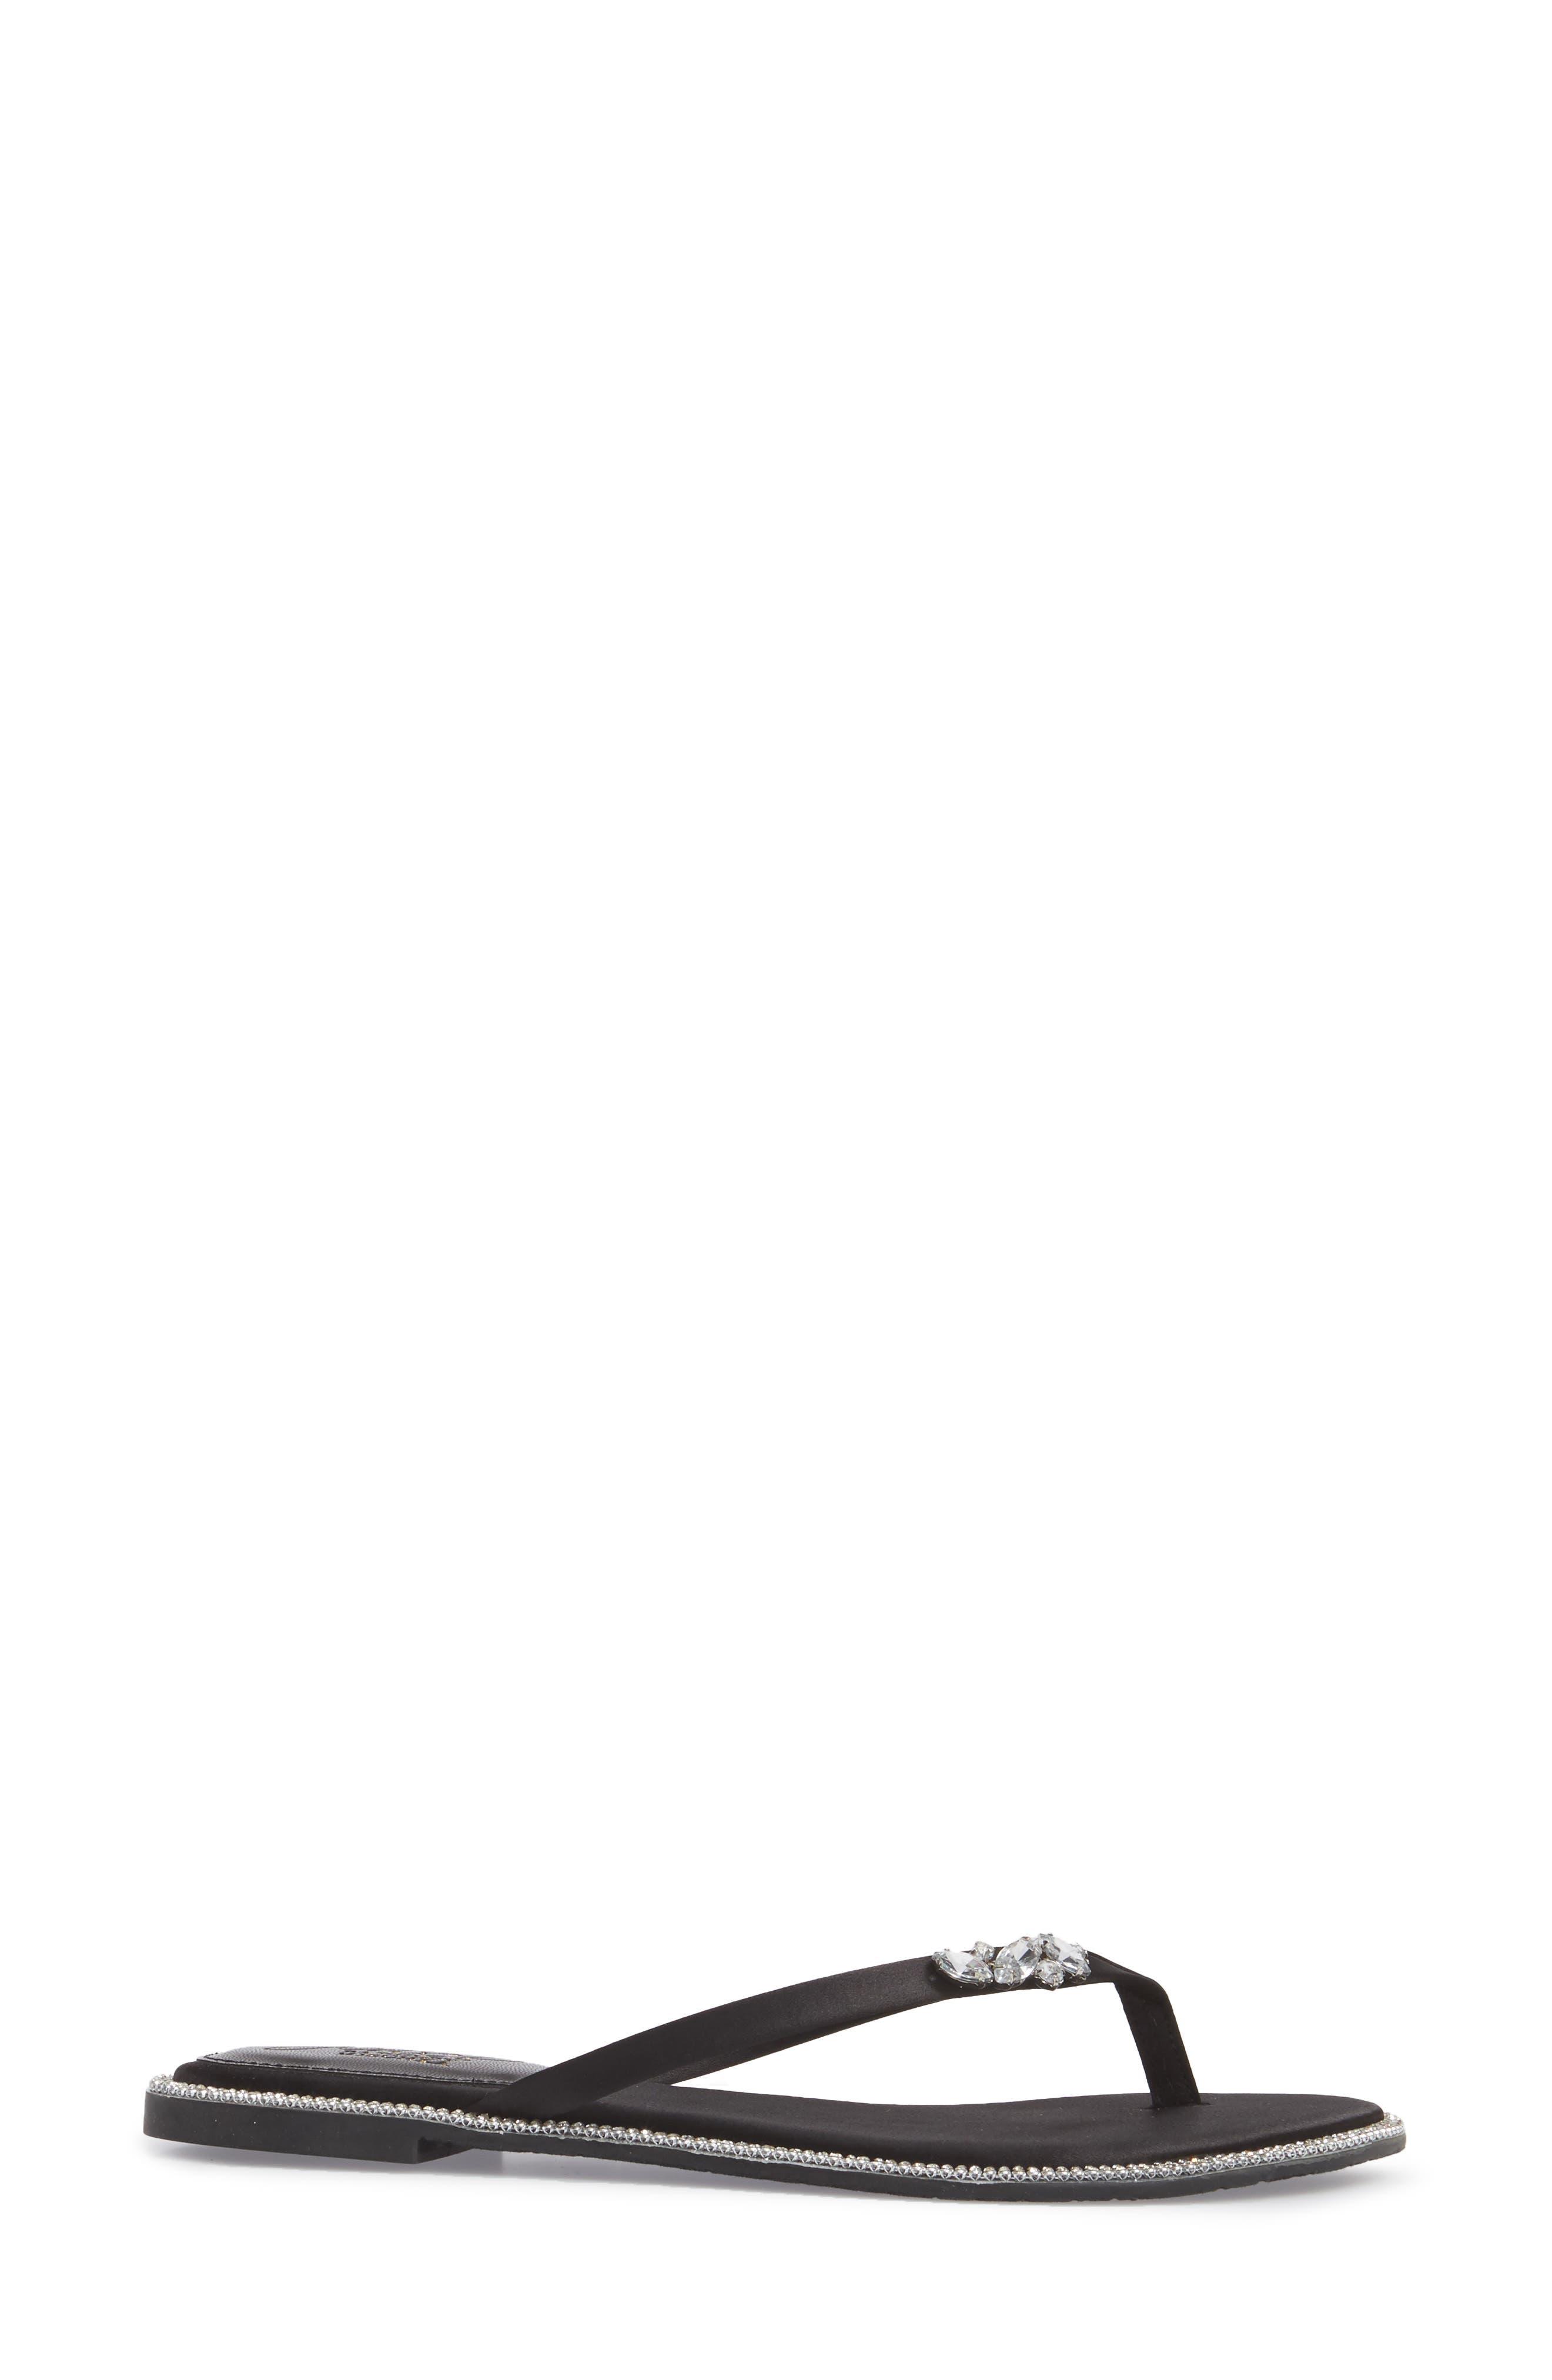 JEWEL BADGLEY MISCHKA,                             Thalia Crystal Embellished Flip Flop,                             Alternate thumbnail 3, color,                             015